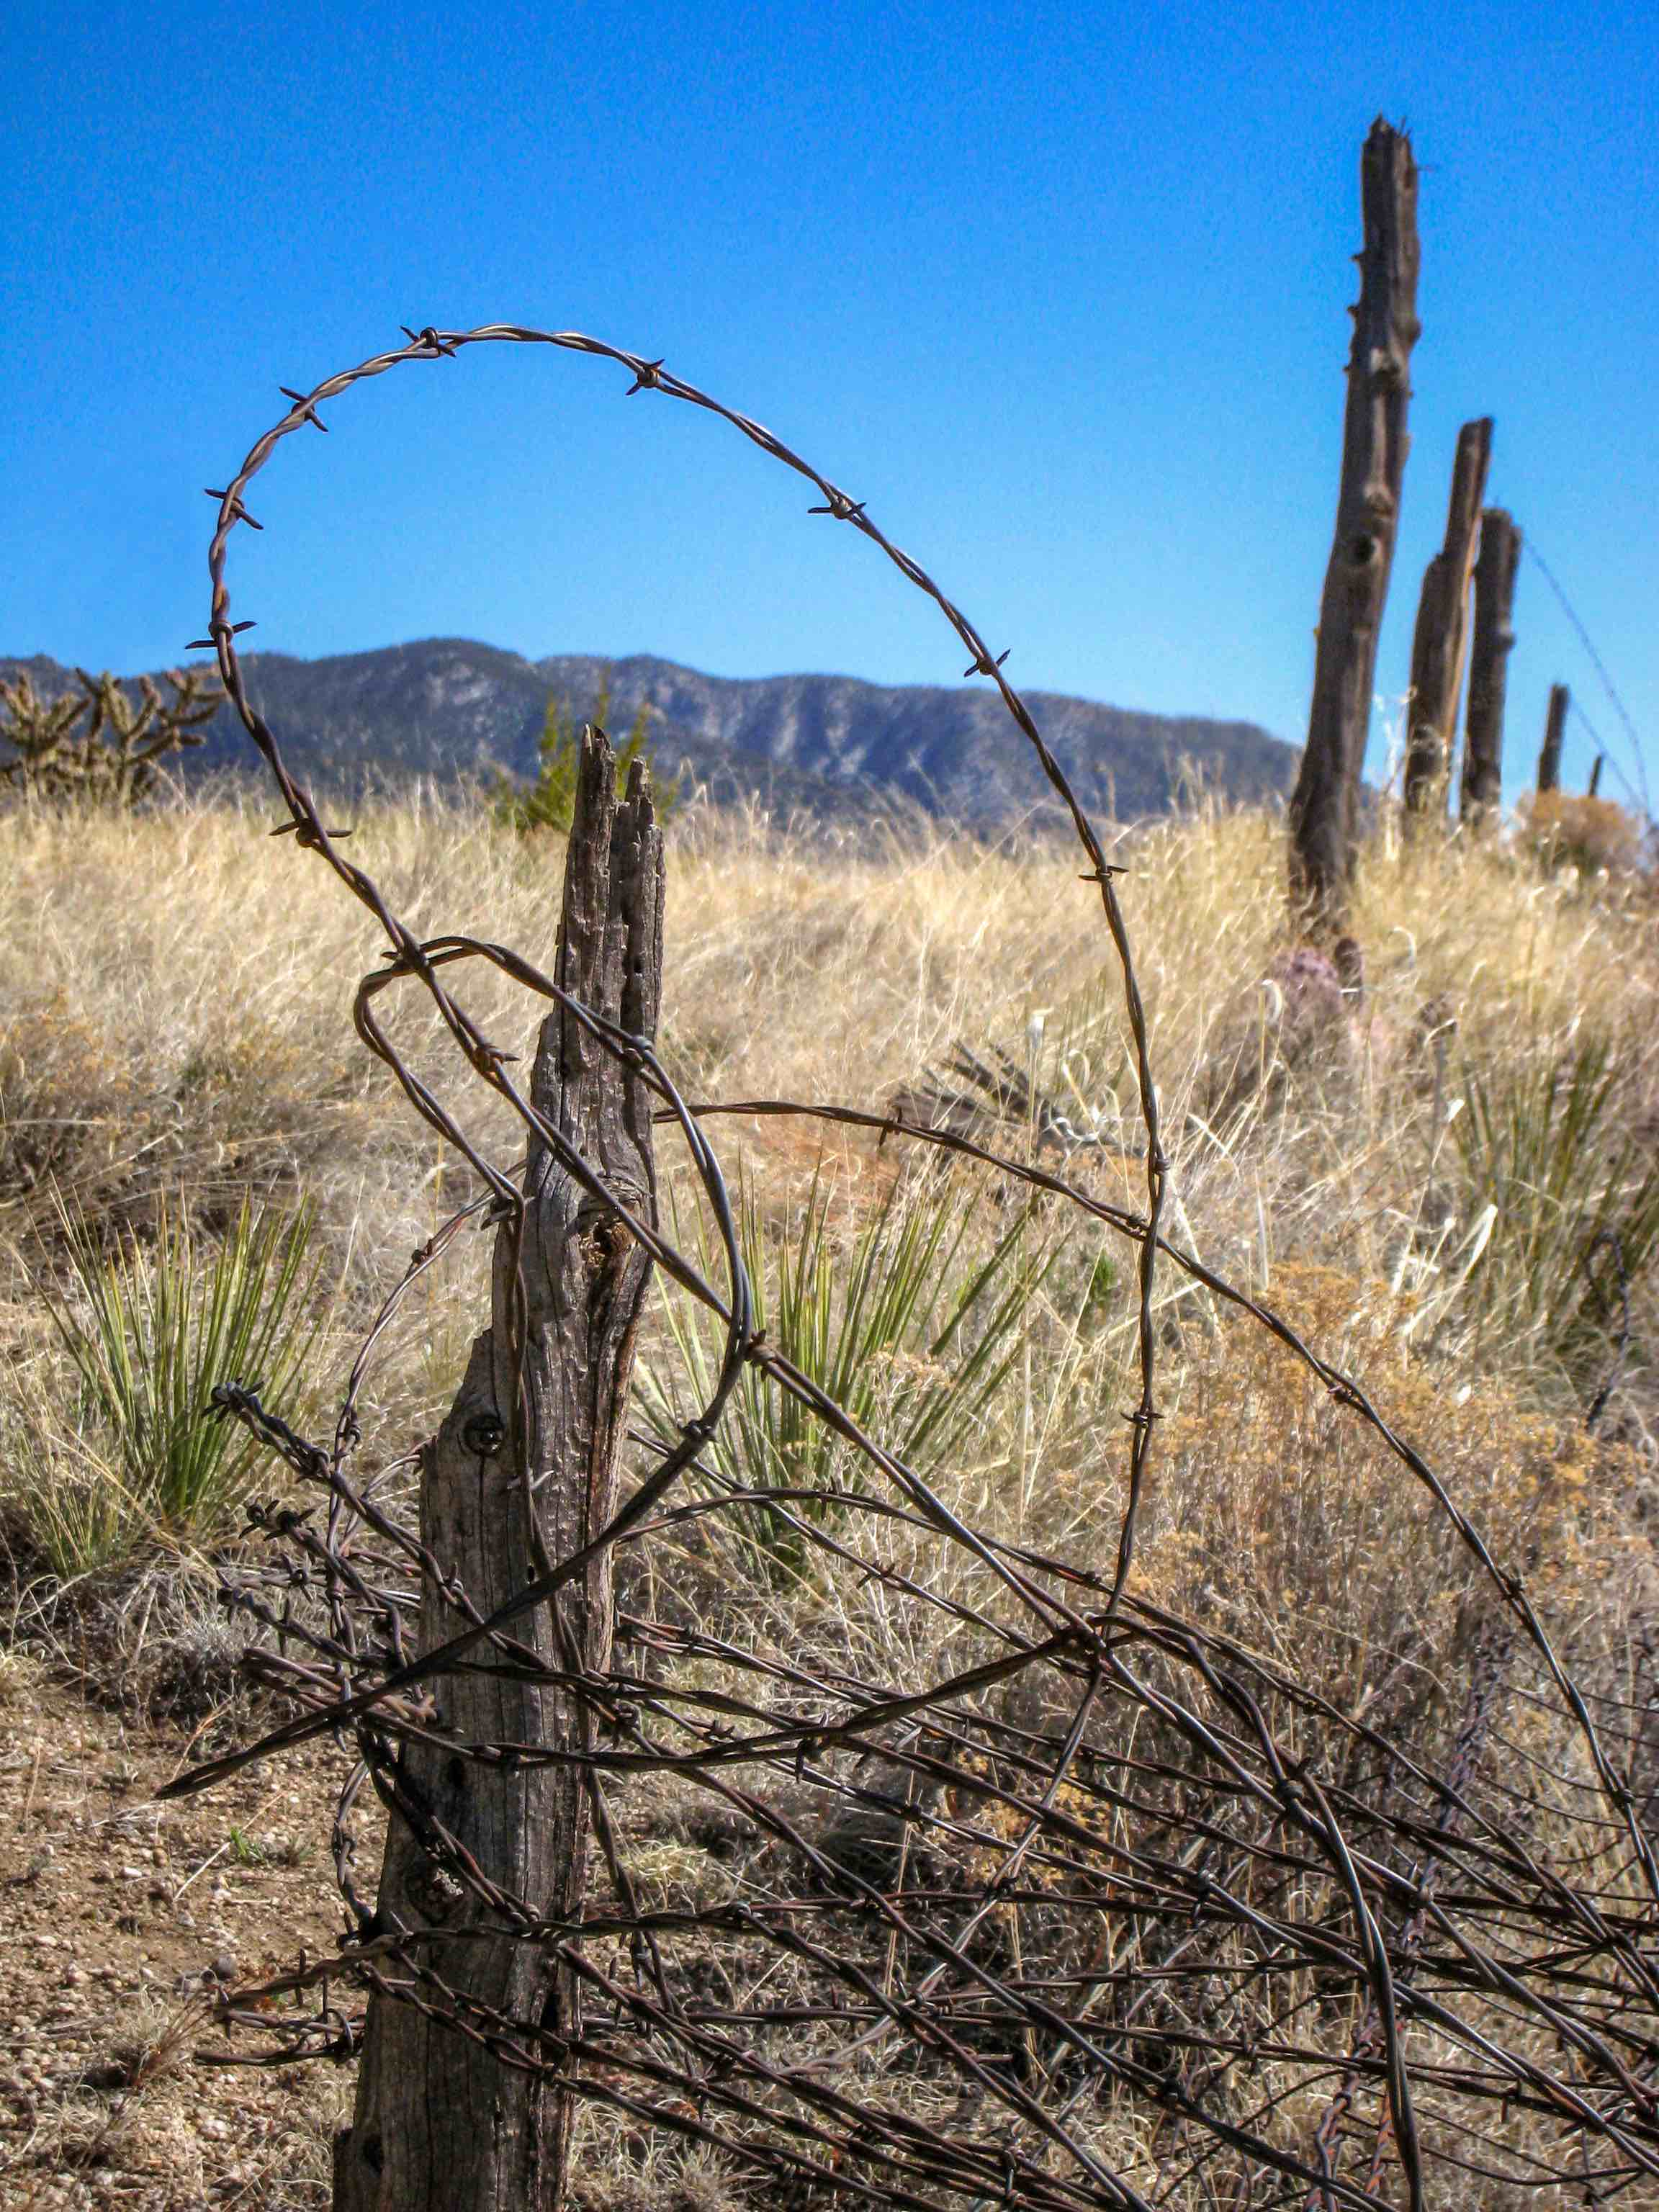 Western Fence Wire